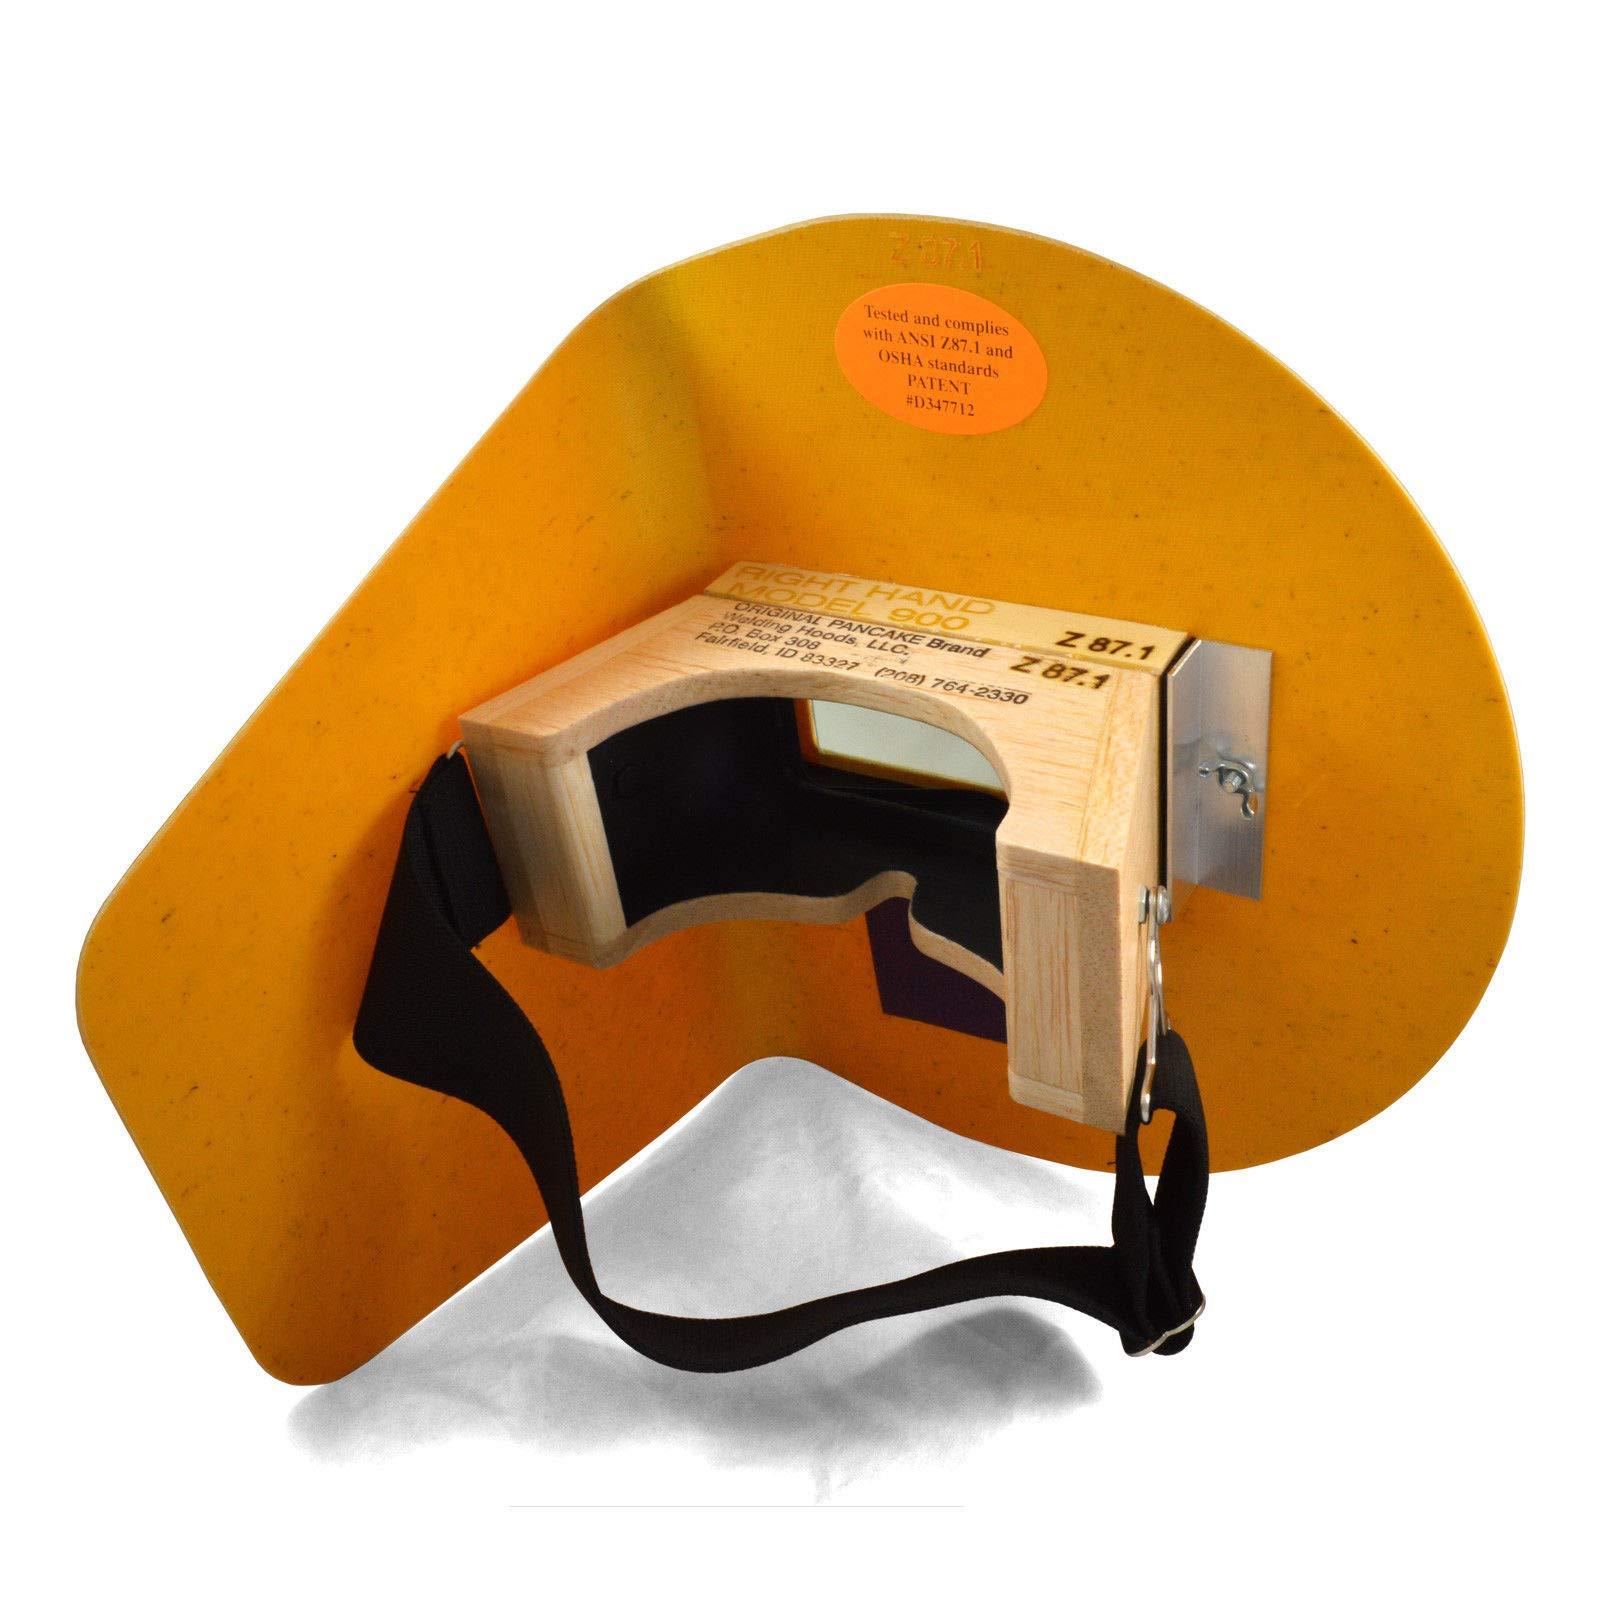 The Original Pancake Welding Hood Helmet w/Strap - Right Handed by The Original (Image #2)